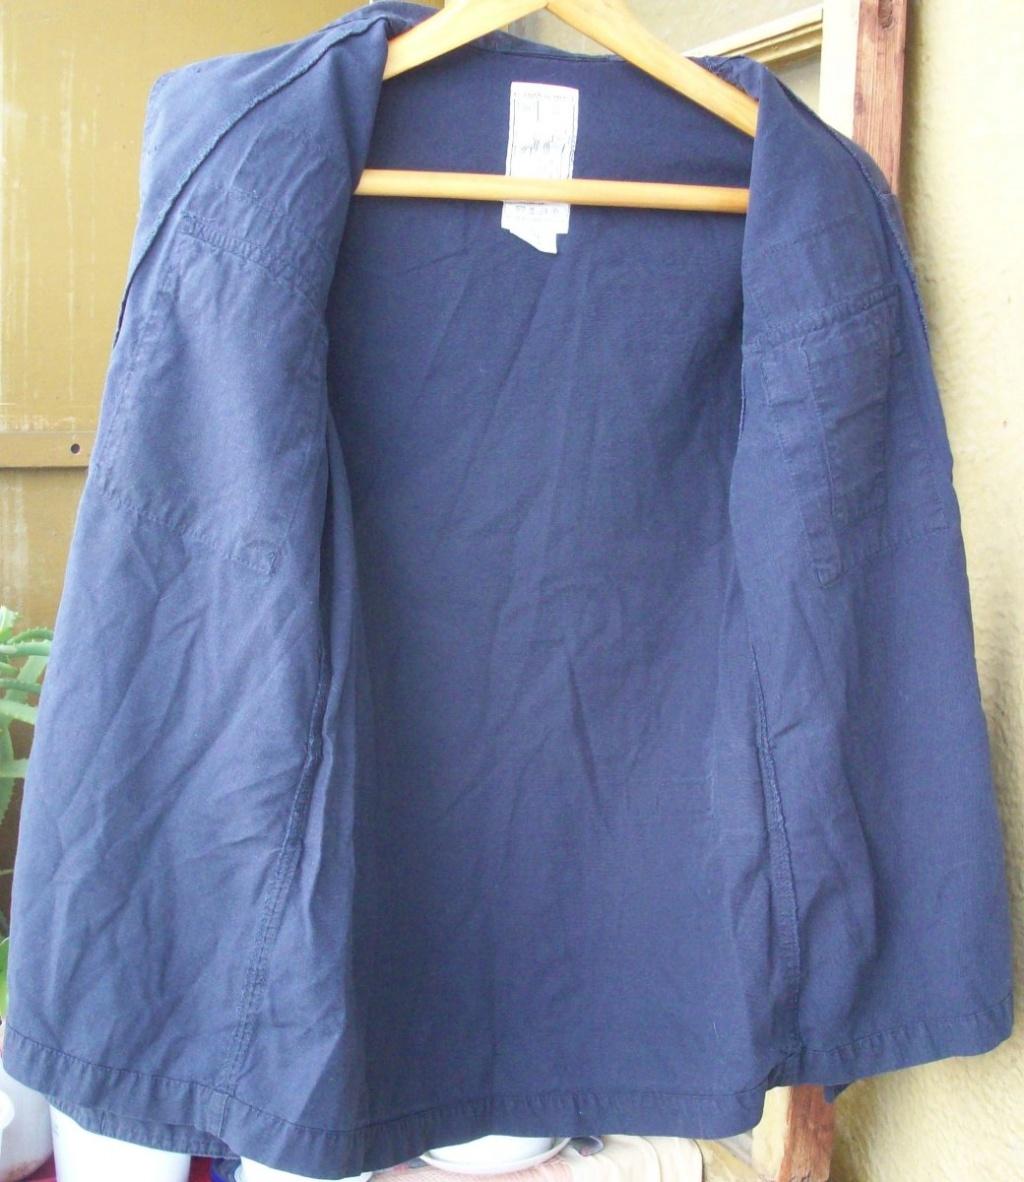 Norwegian Navy blue work jacket... What model? 02110